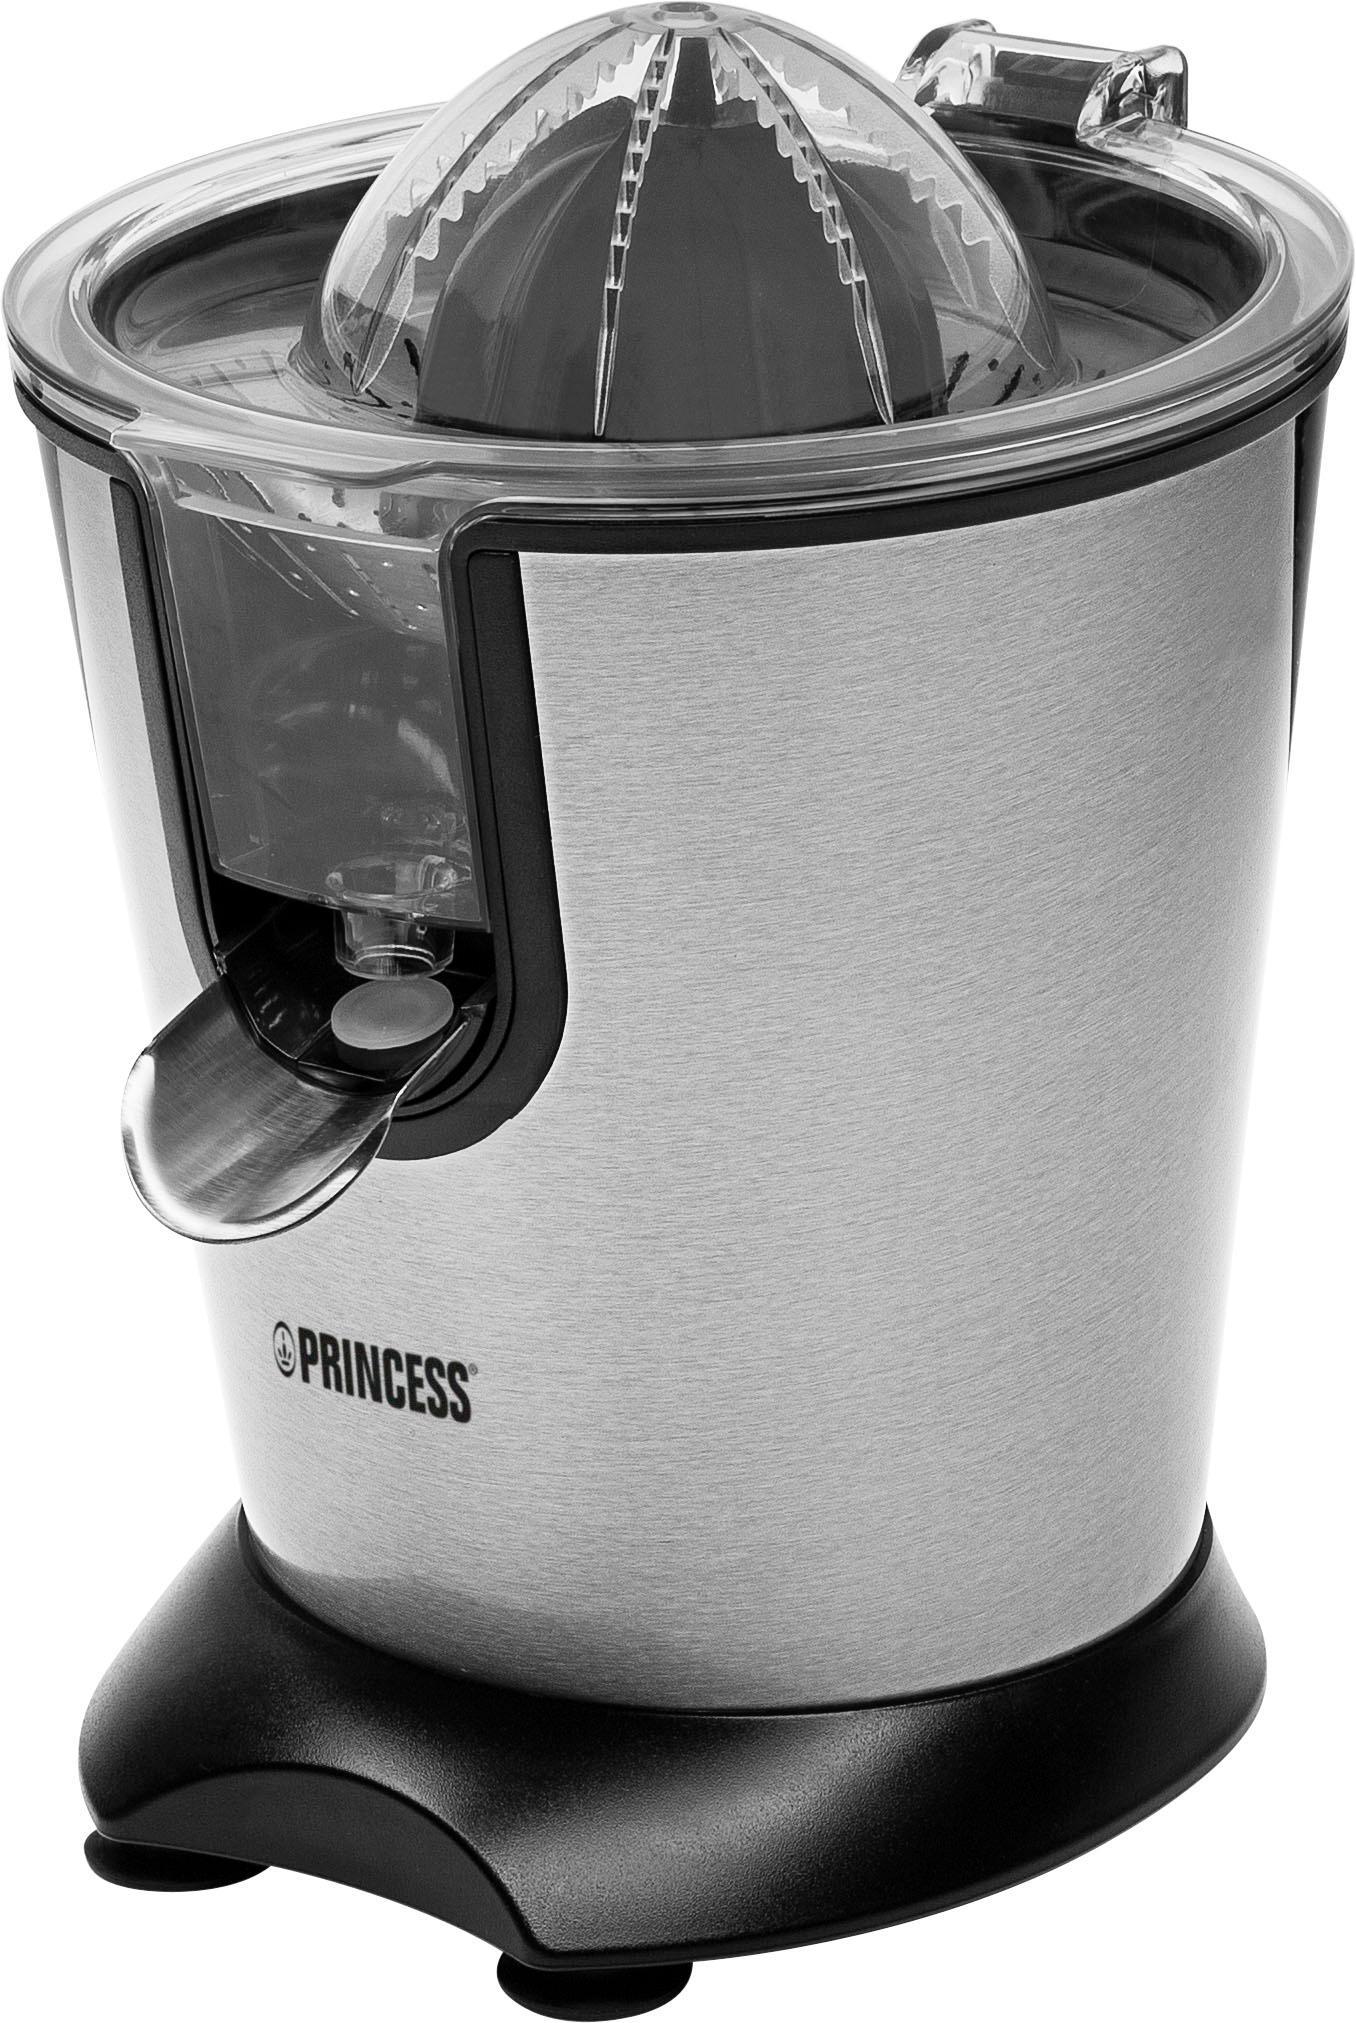 PRINCESS Entsafter Easy Juicer 160 Watt Technik & Freizeit/Elektrogeräte/Haushaltsgeräte/Küchenkleingeräte/Entsafter/Zentrifugenentsafter